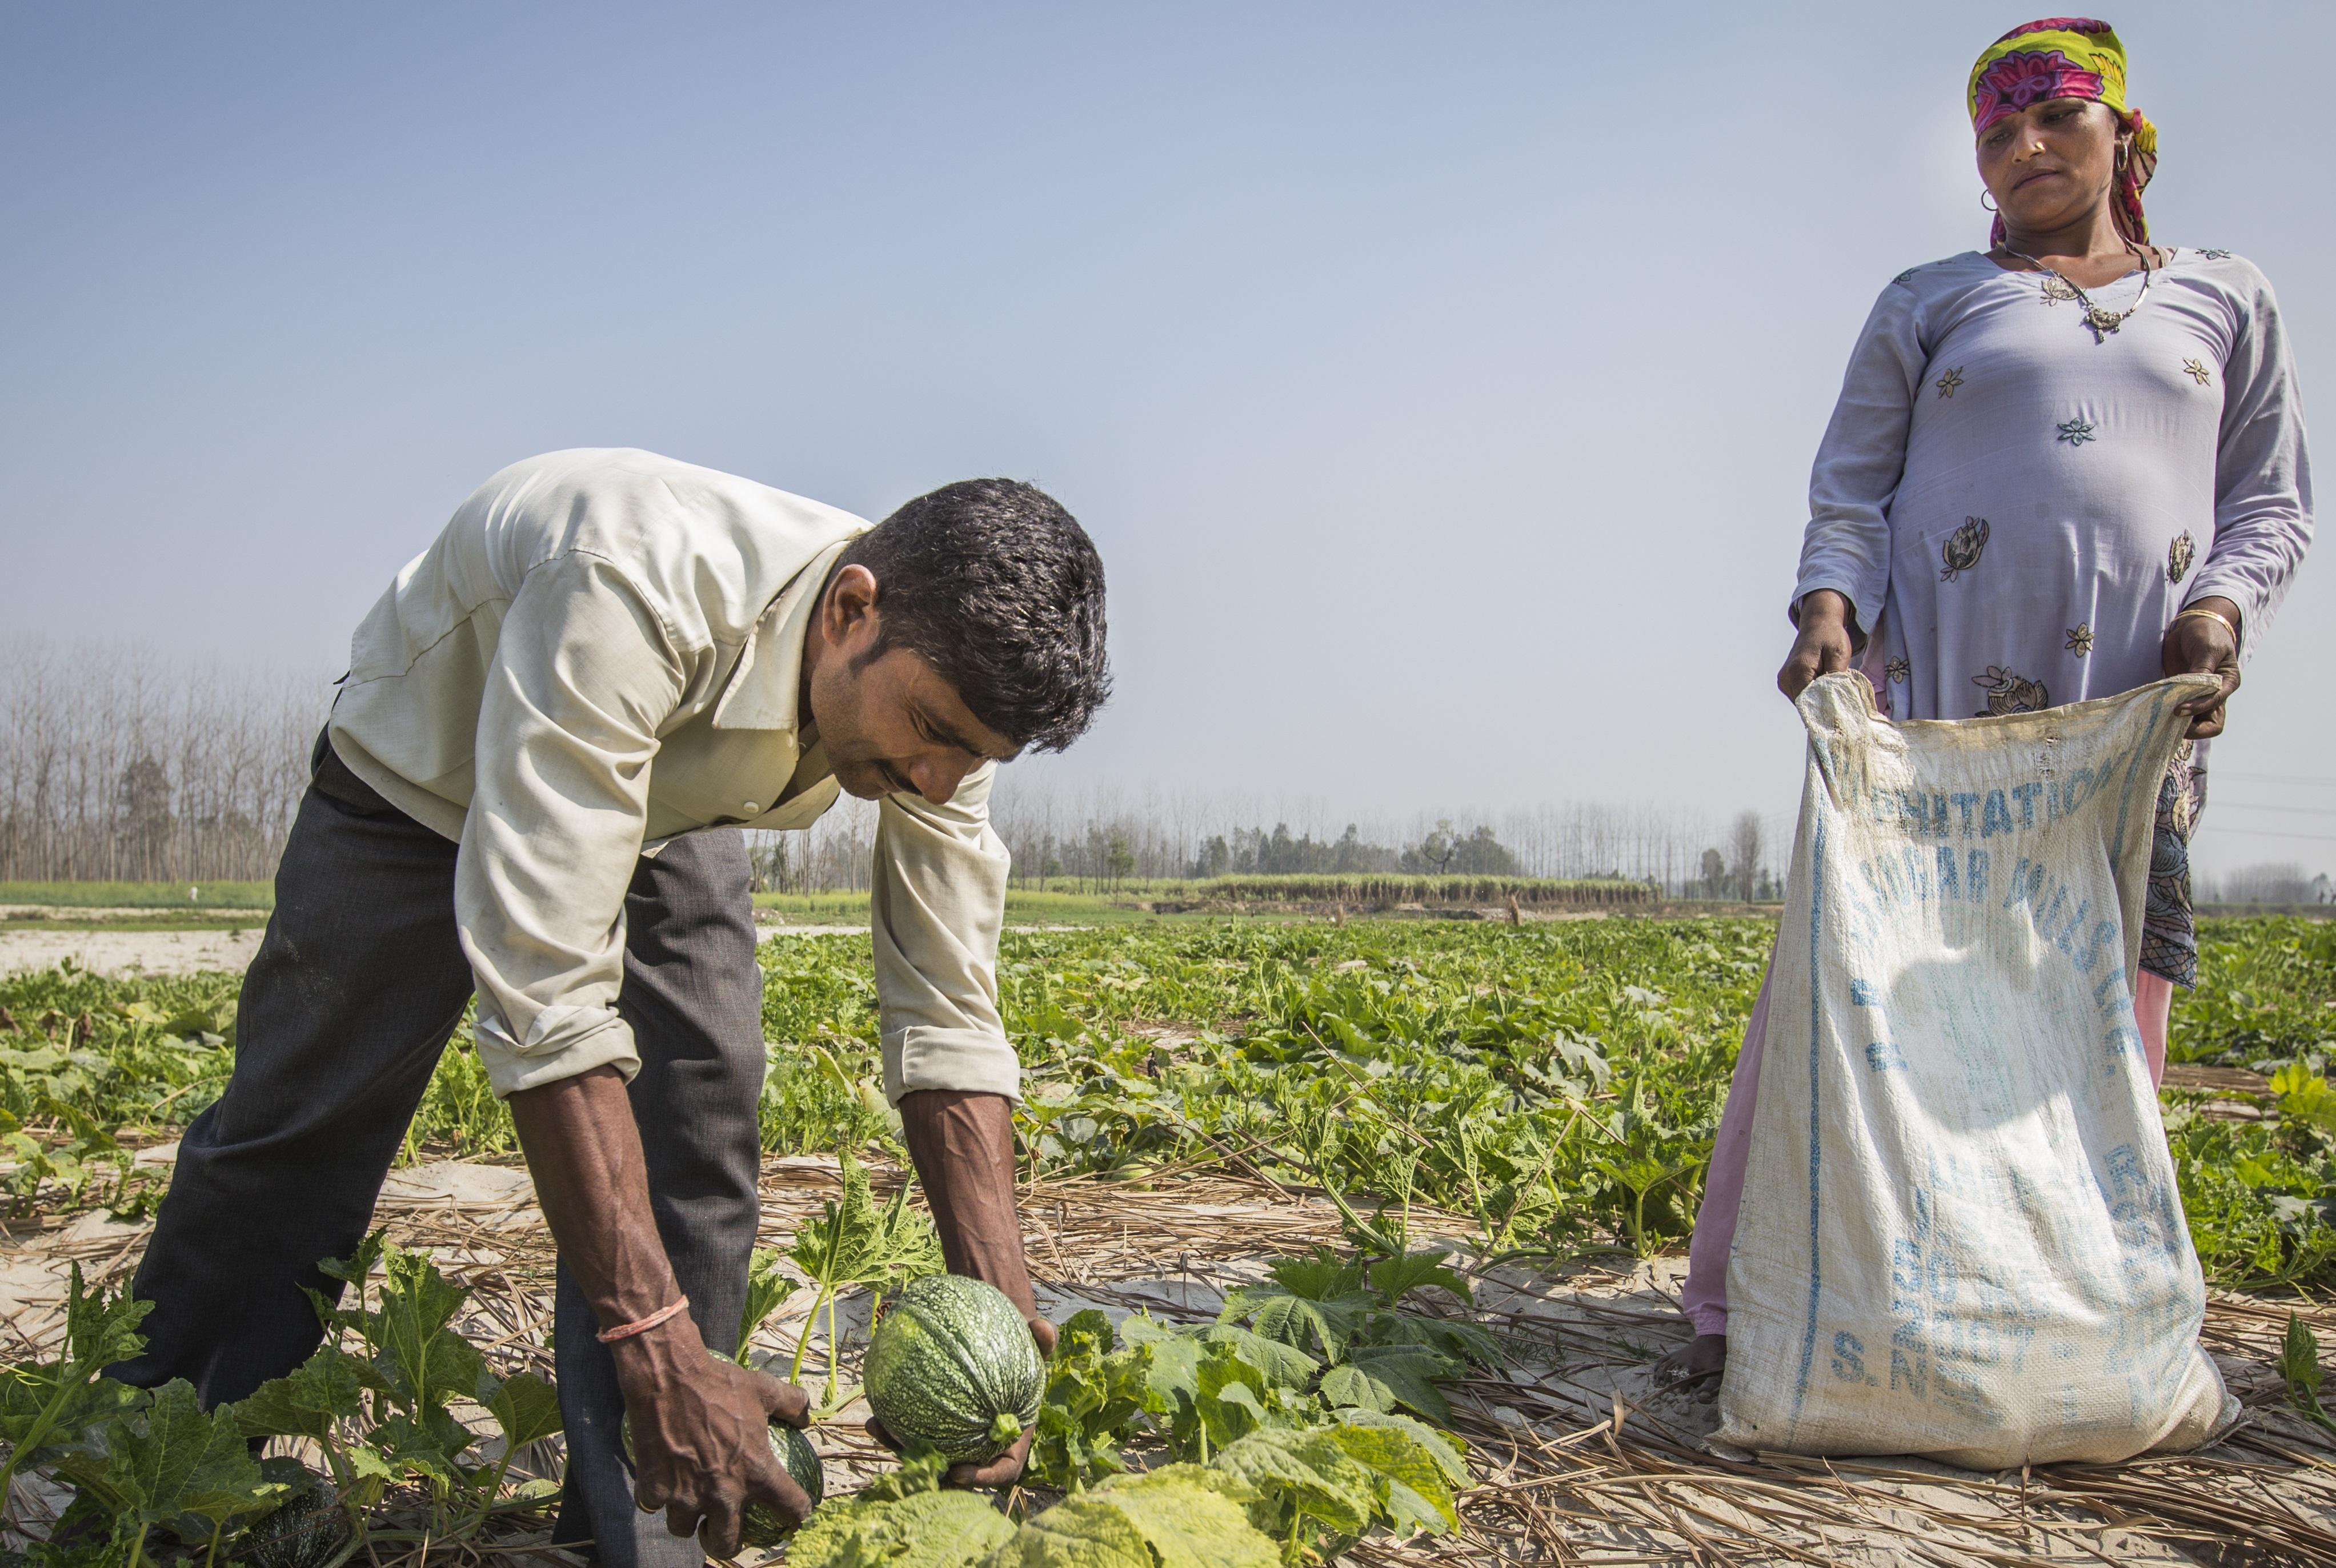 Farmers harvest squash in Uttarakhand, India. (Photo: Jitendra Raj Bajracharya/ICIMOD)